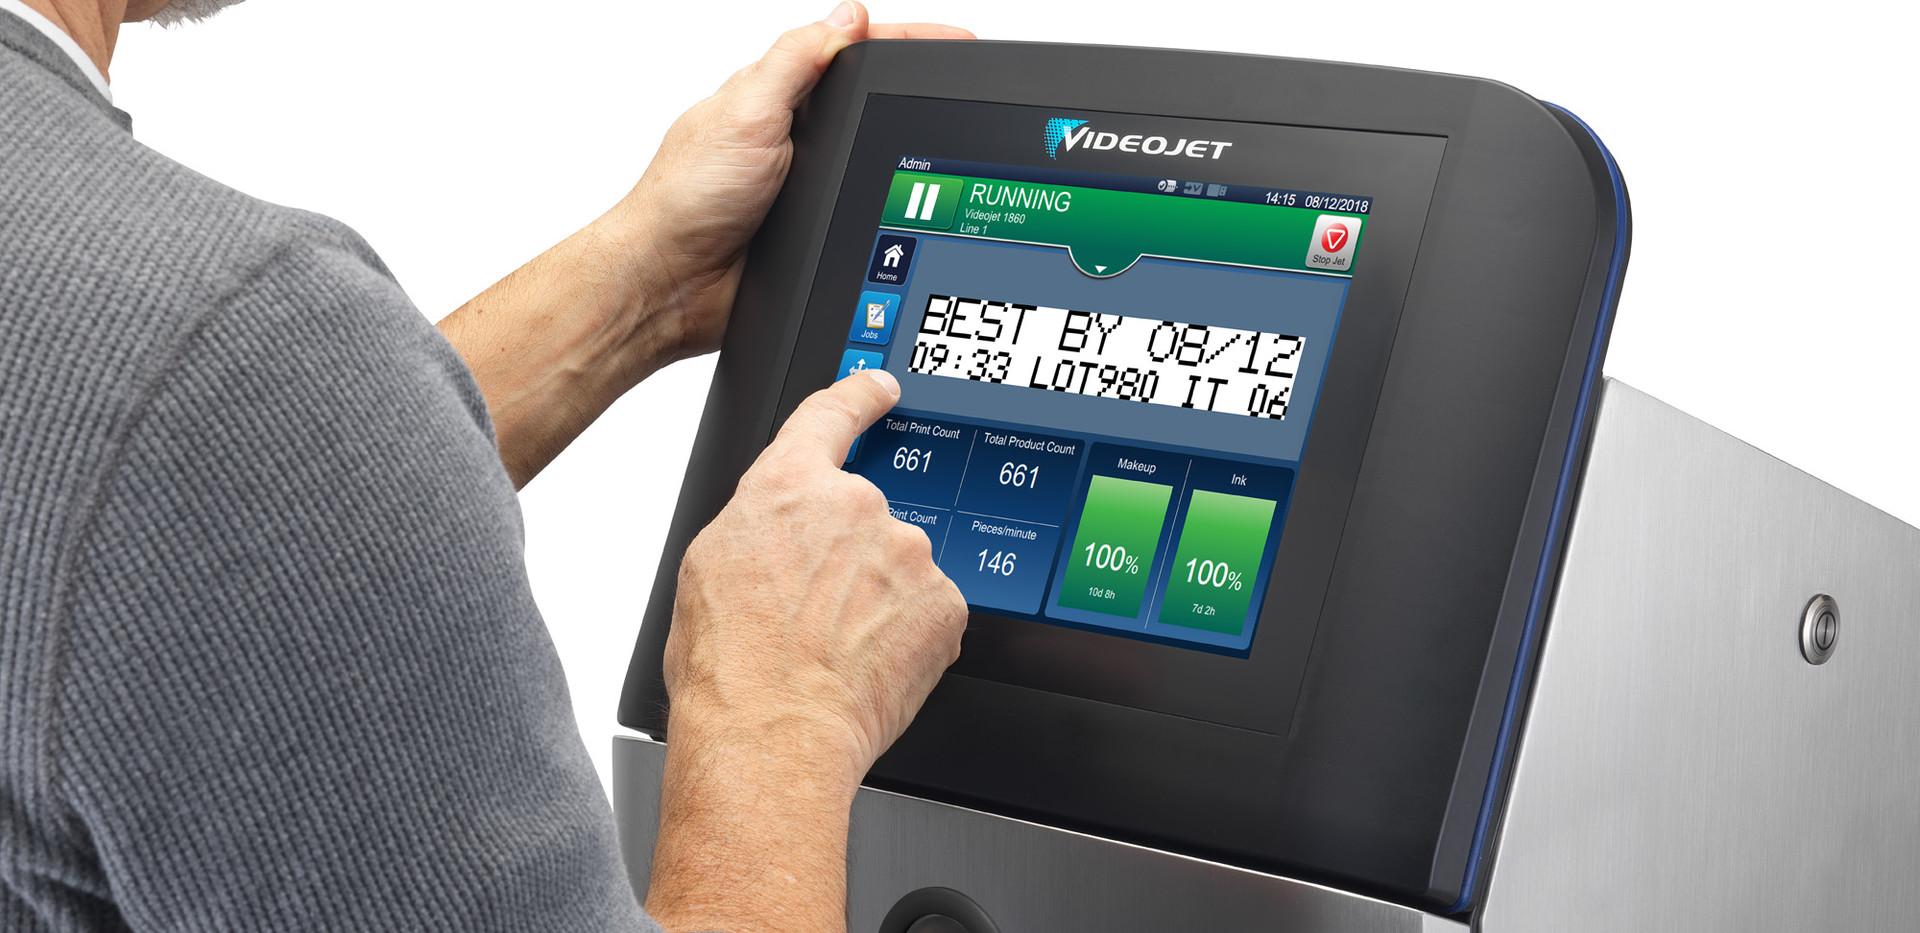 VJ1860 touchscreen display